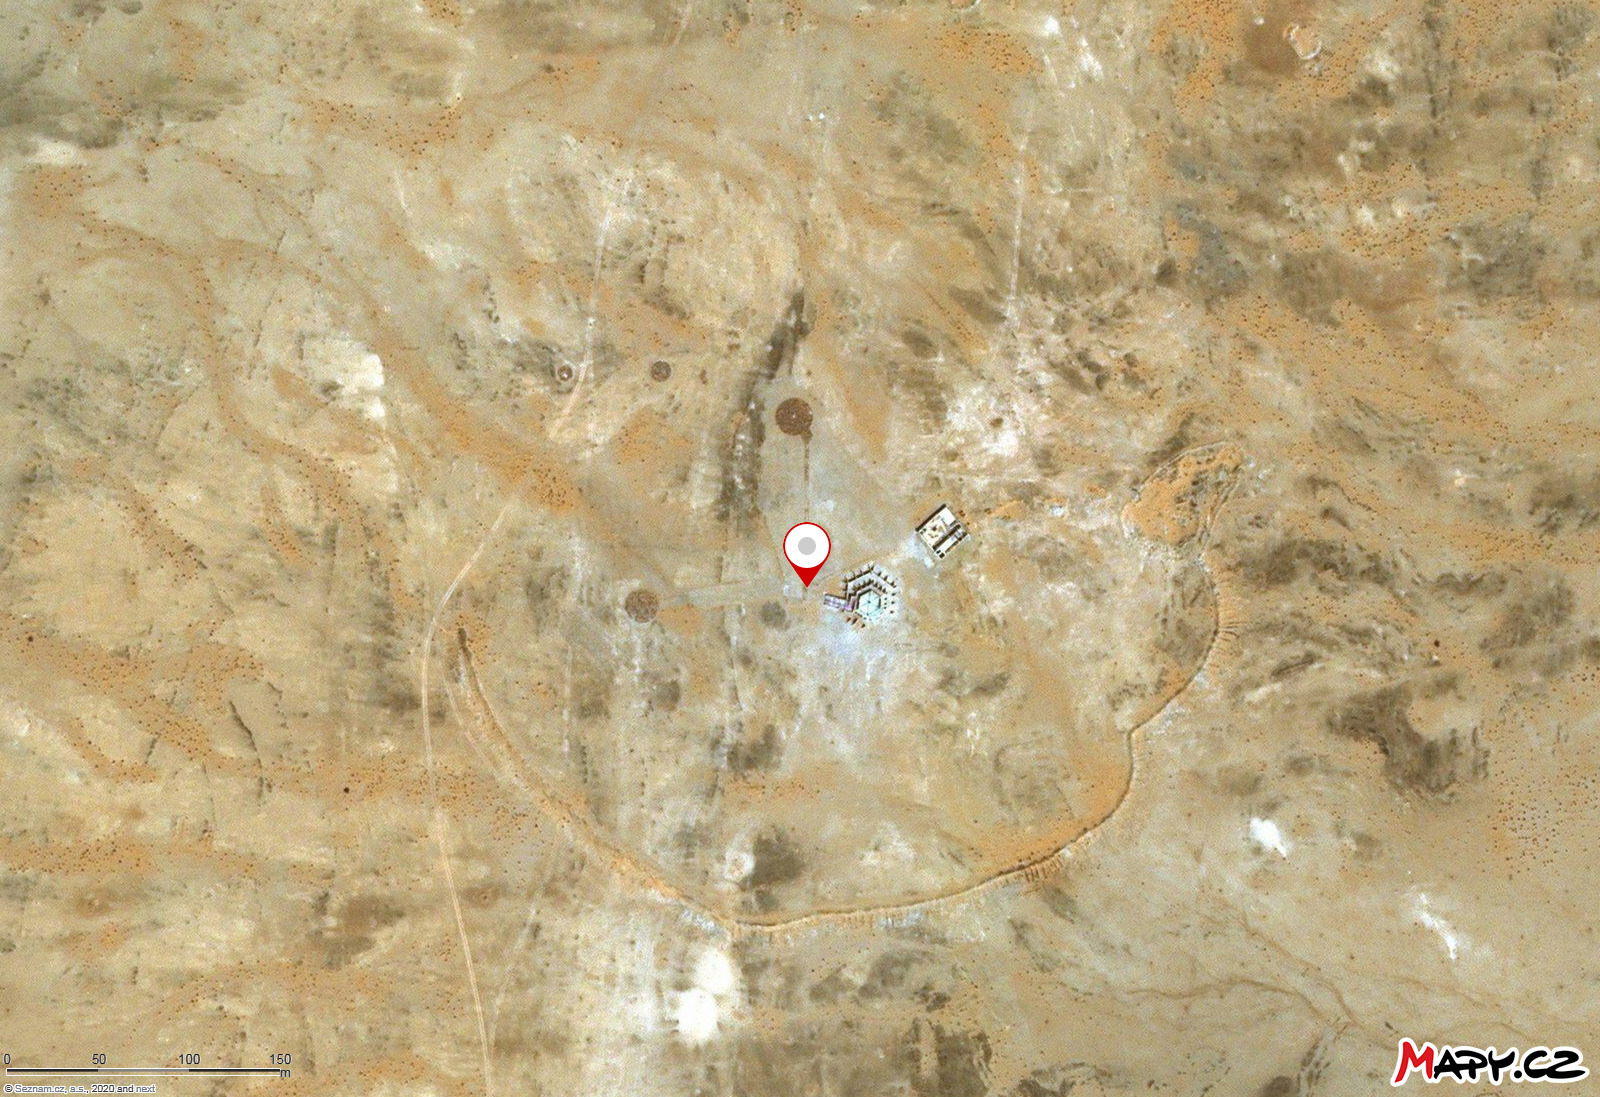 Gazetteer - PlacesNames -Localisation géographique - MapPlanet - Page 2 22_64110